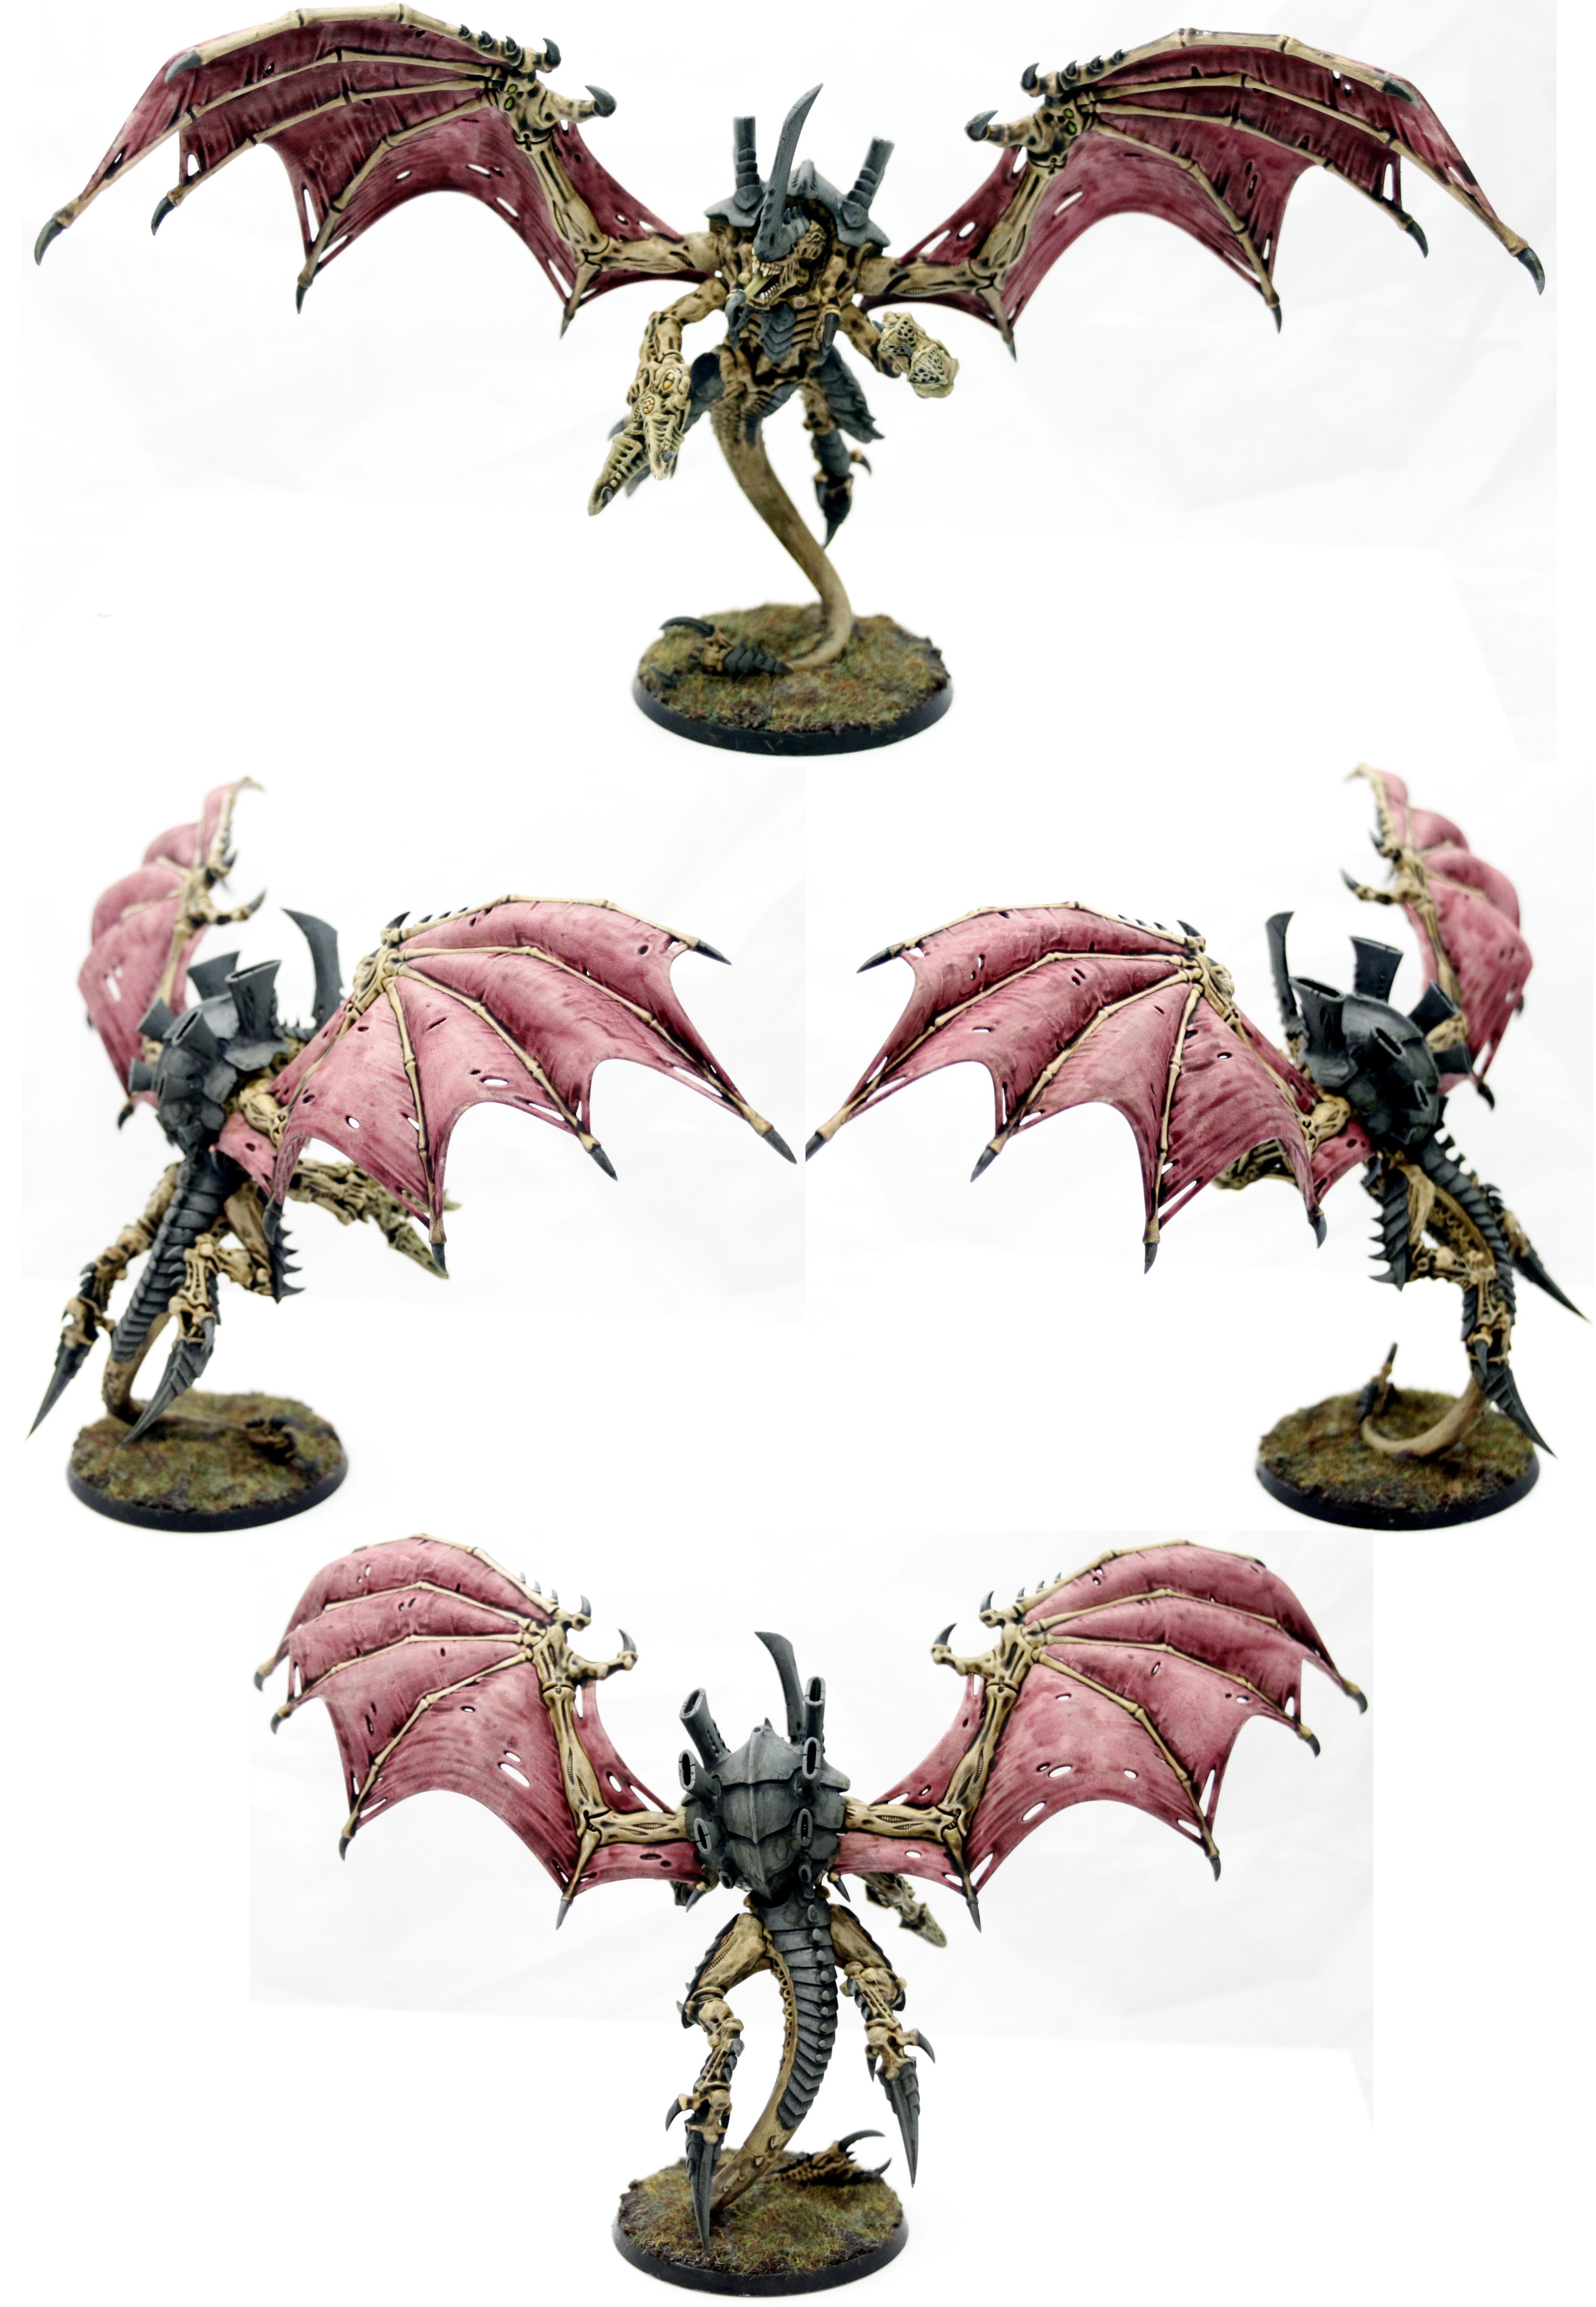 Hive, Hive Tyrant, Tyranids, Winged